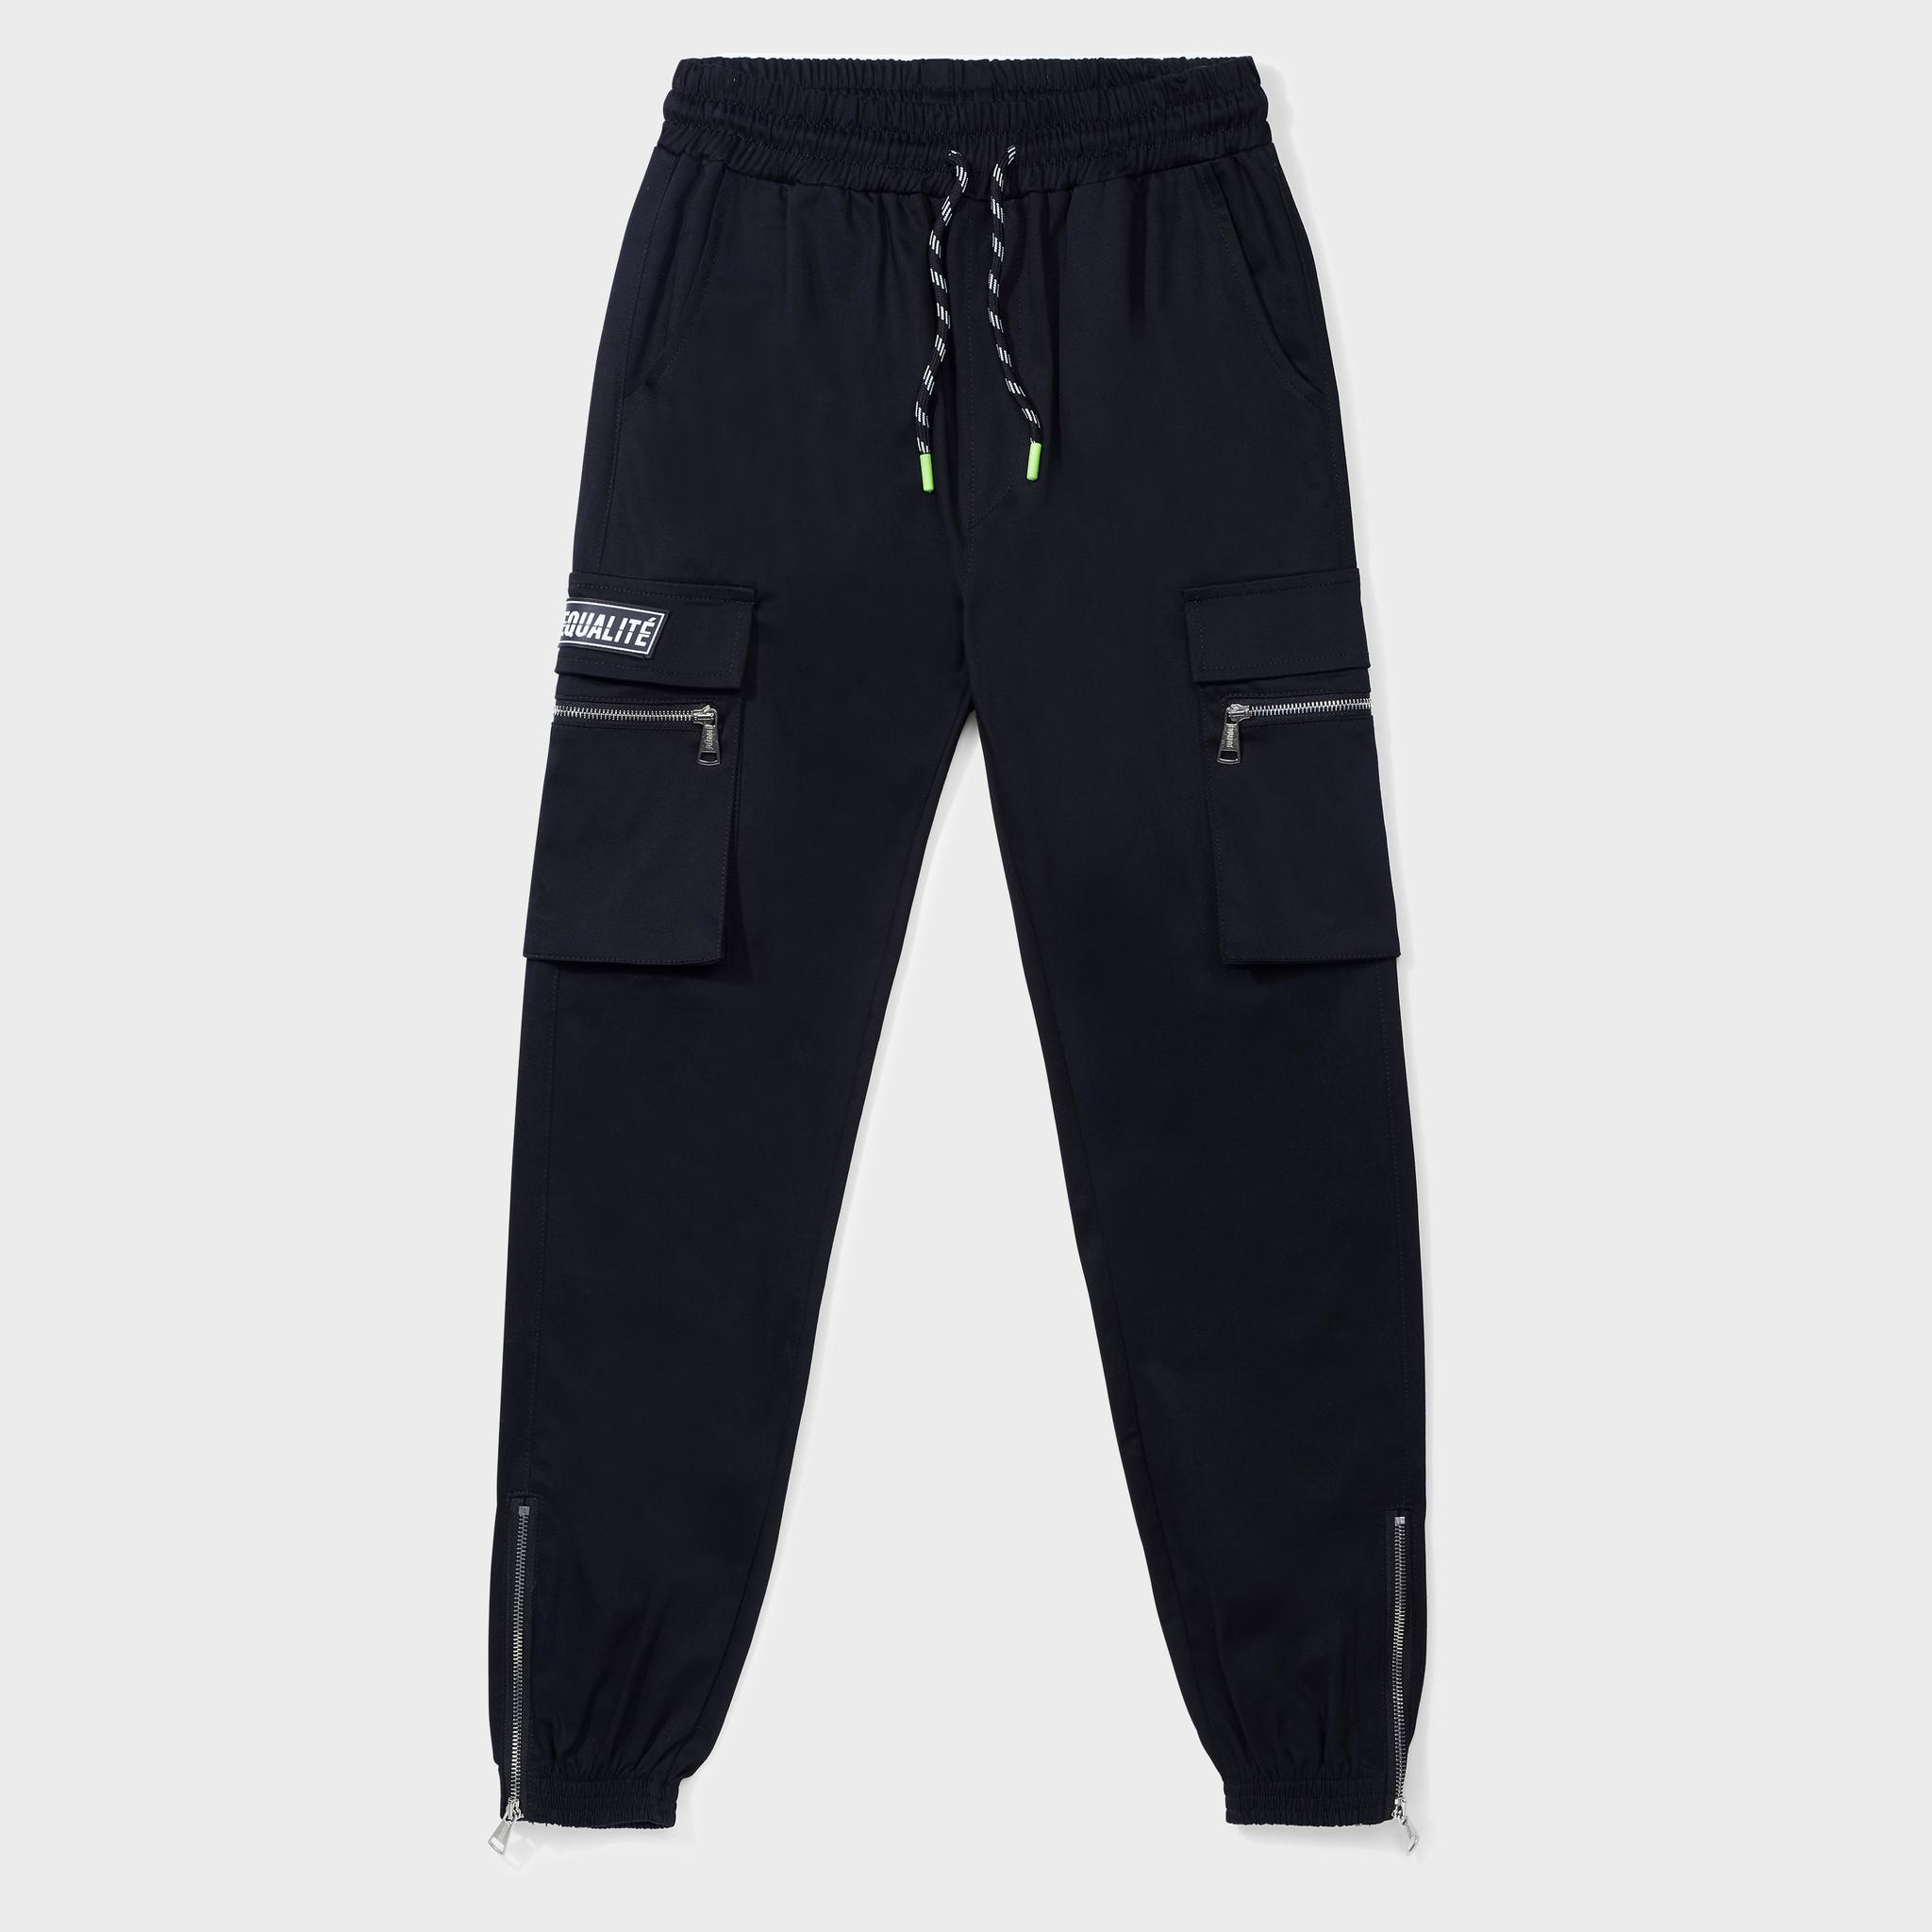 FUTURE CARGO PANTS BLACK-1